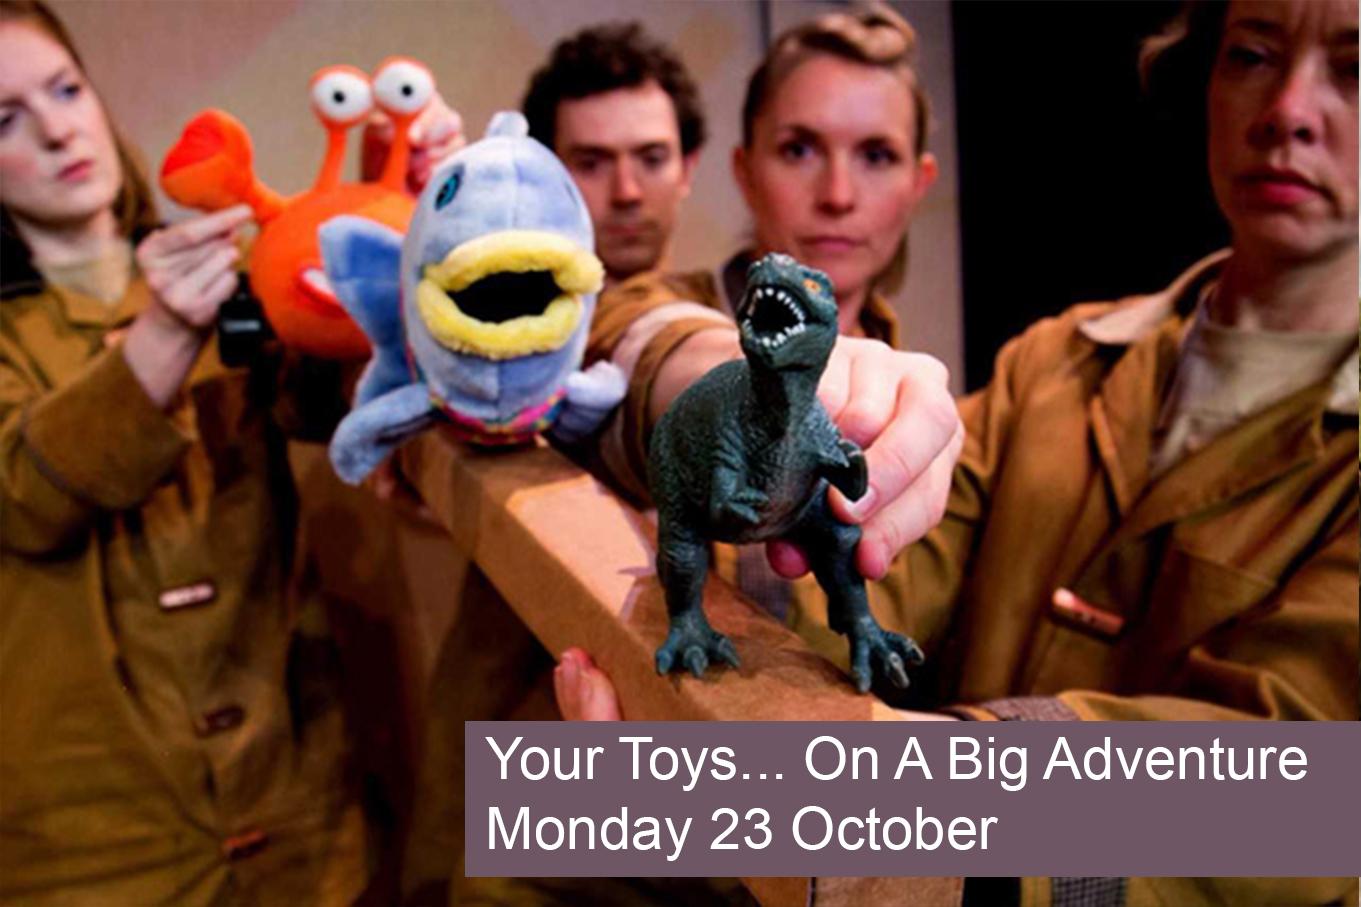 Monday 23 October